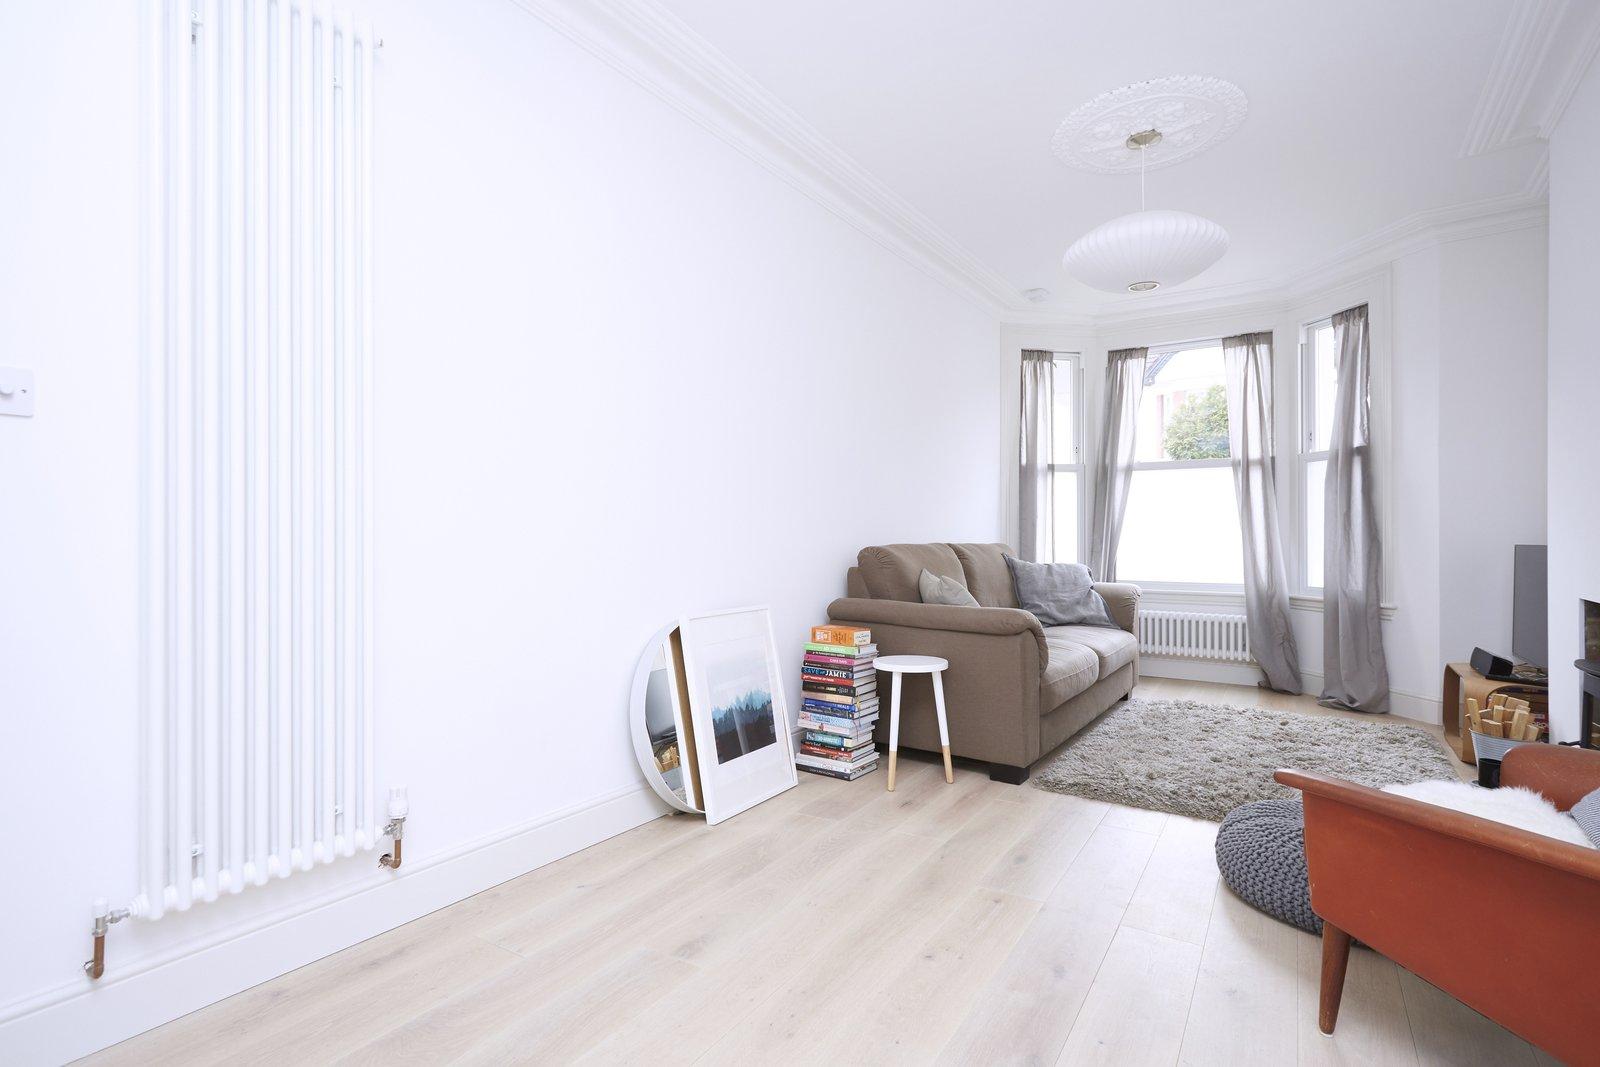 Living Room, Sofa, Coffee Tables, Chair, Ceiling Lighting, Medium Hardwood Floor, Light Hardwood Floor, and Wood Burning Fireplace  SW House by Studio AVC